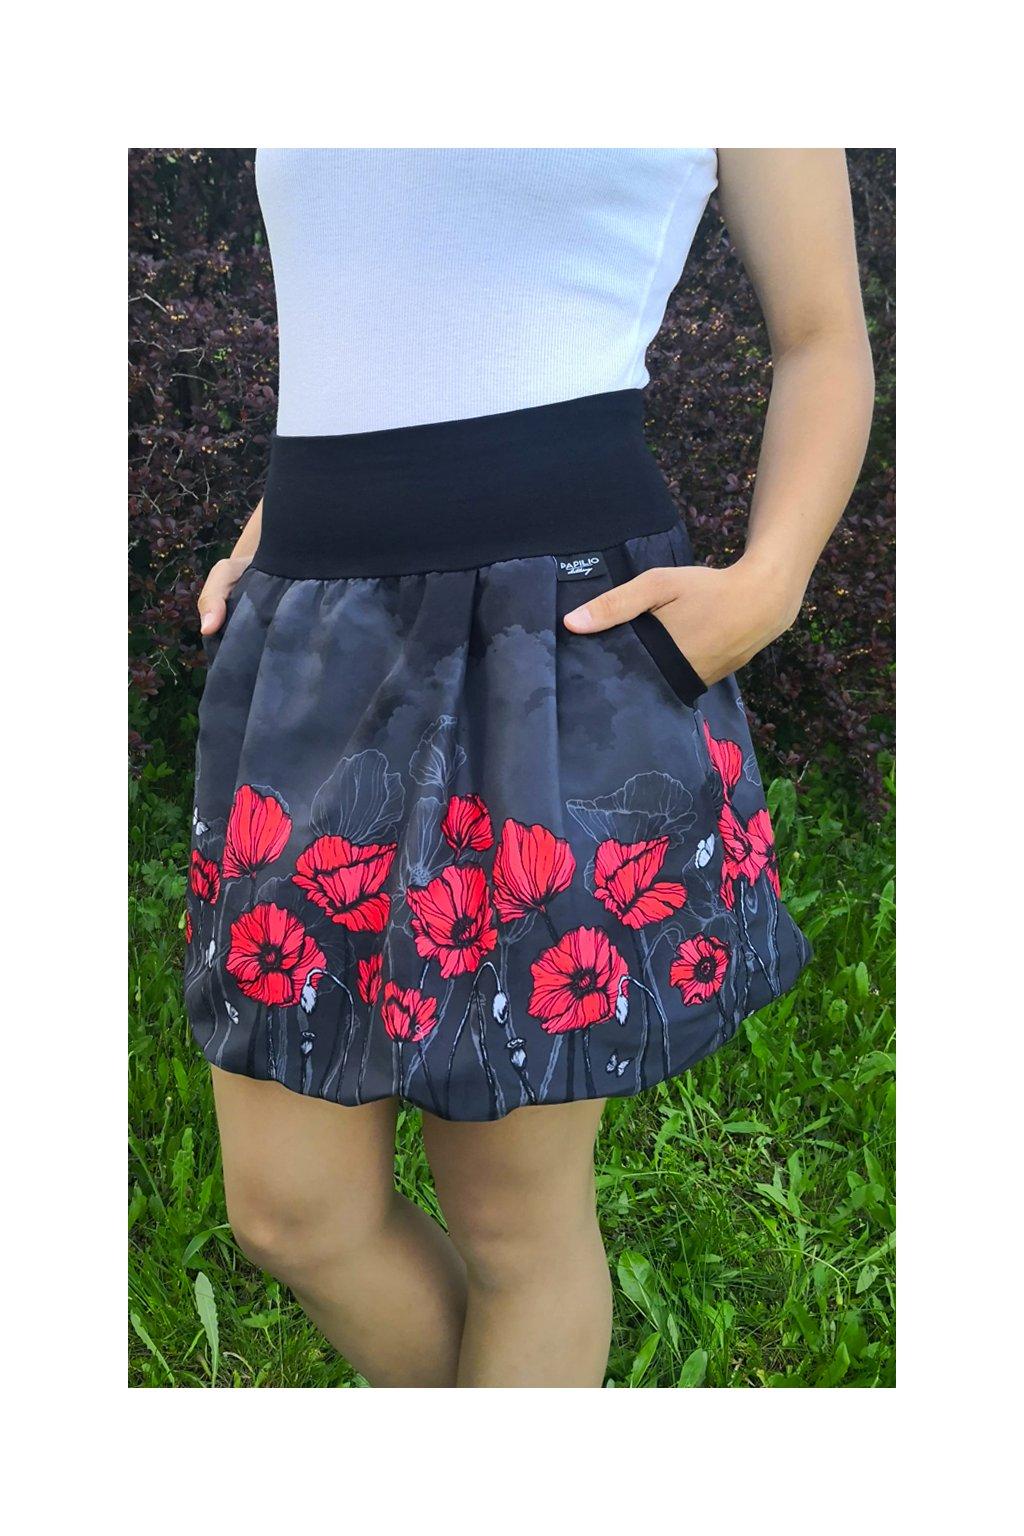 balonova sukne tmave rude maky papilio clothing 1